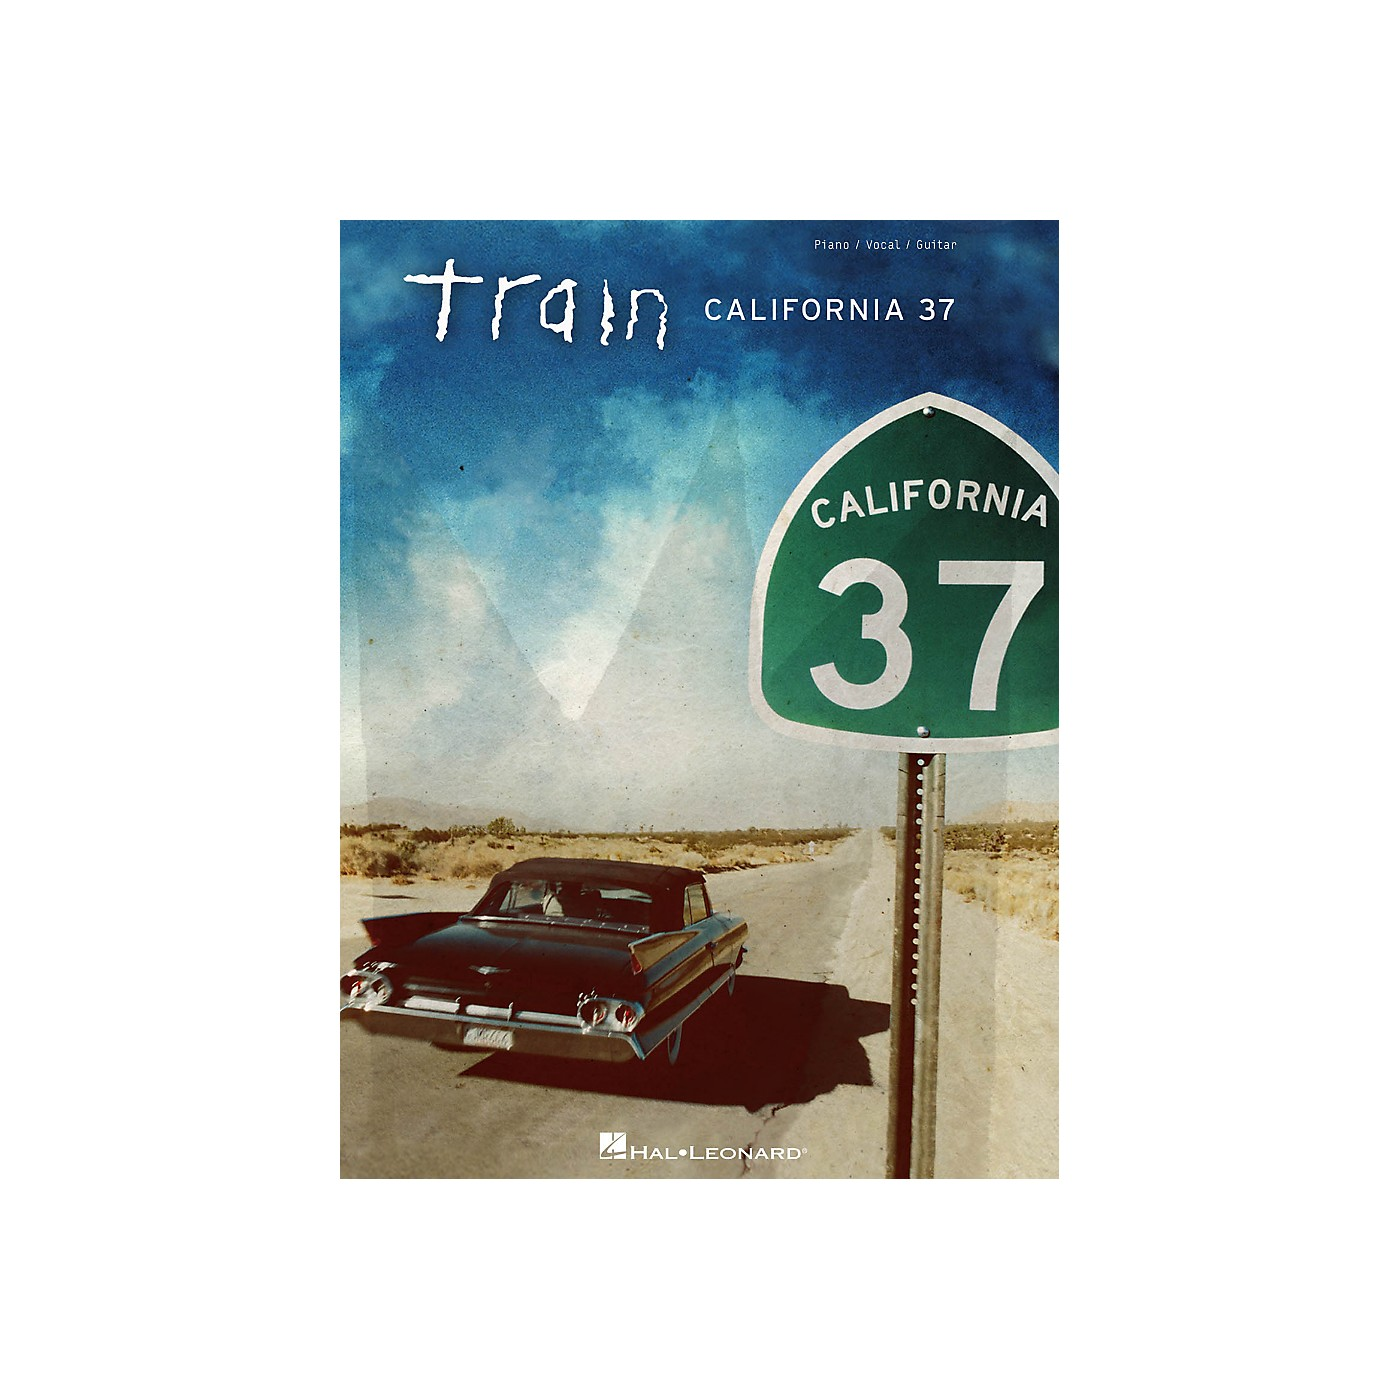 Hal Leonard Train - California 37 for Piano/Vocal/Guitar thumbnail